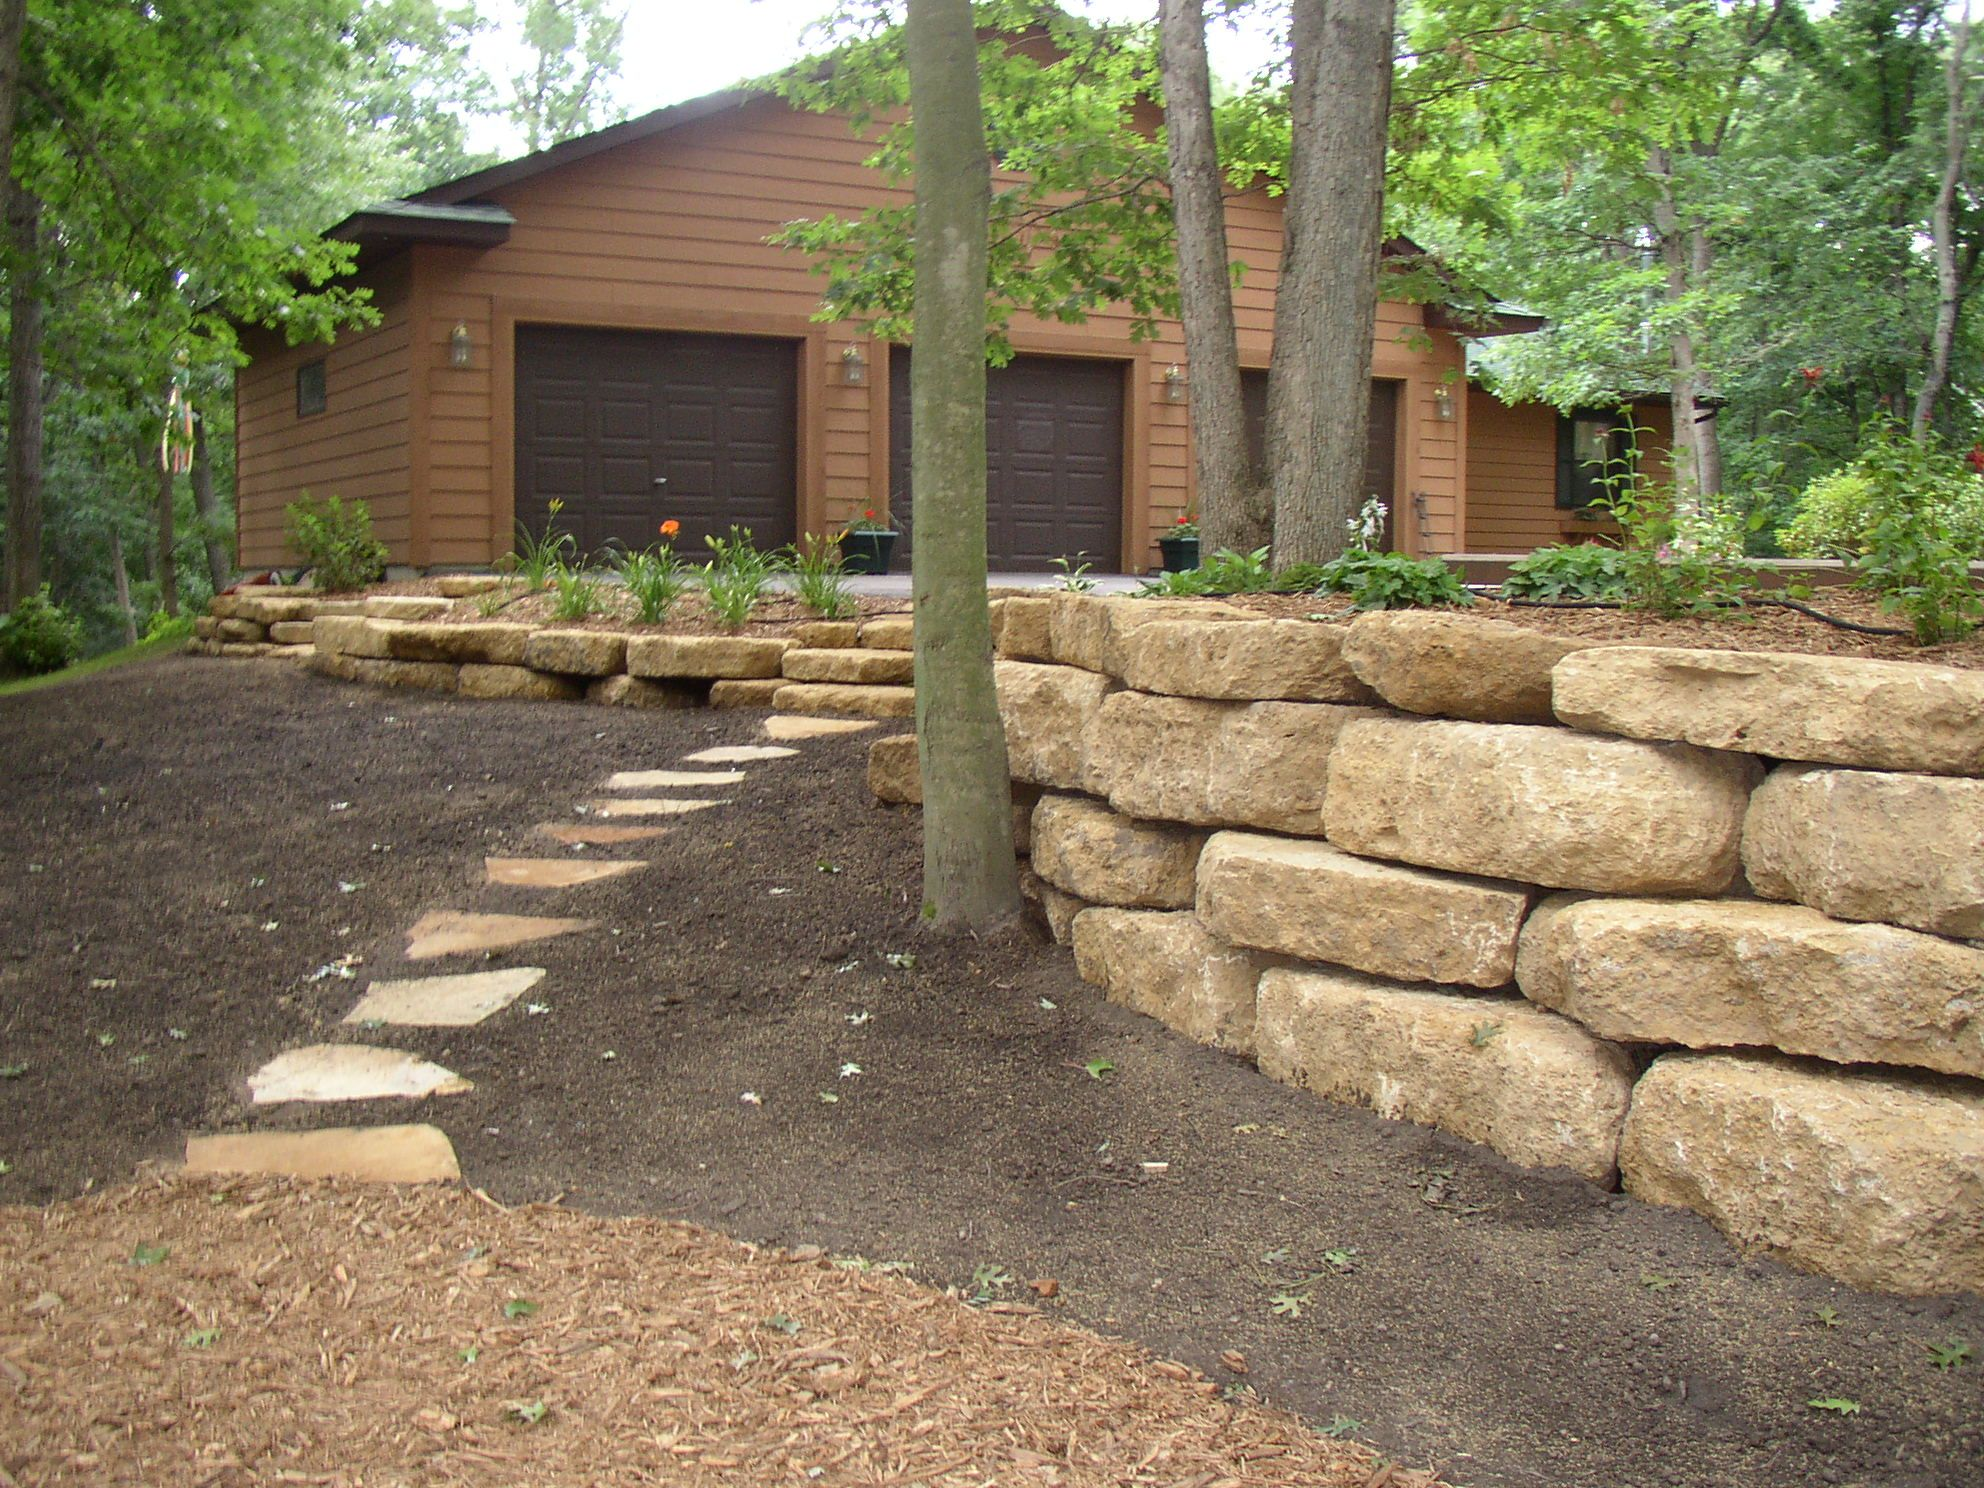 Retaining Walls Modular Block Natural Stone And Boulders Environmentallandscapes Landscaping Retaining Walls Stone Landscaping Large Backyard Landscaping